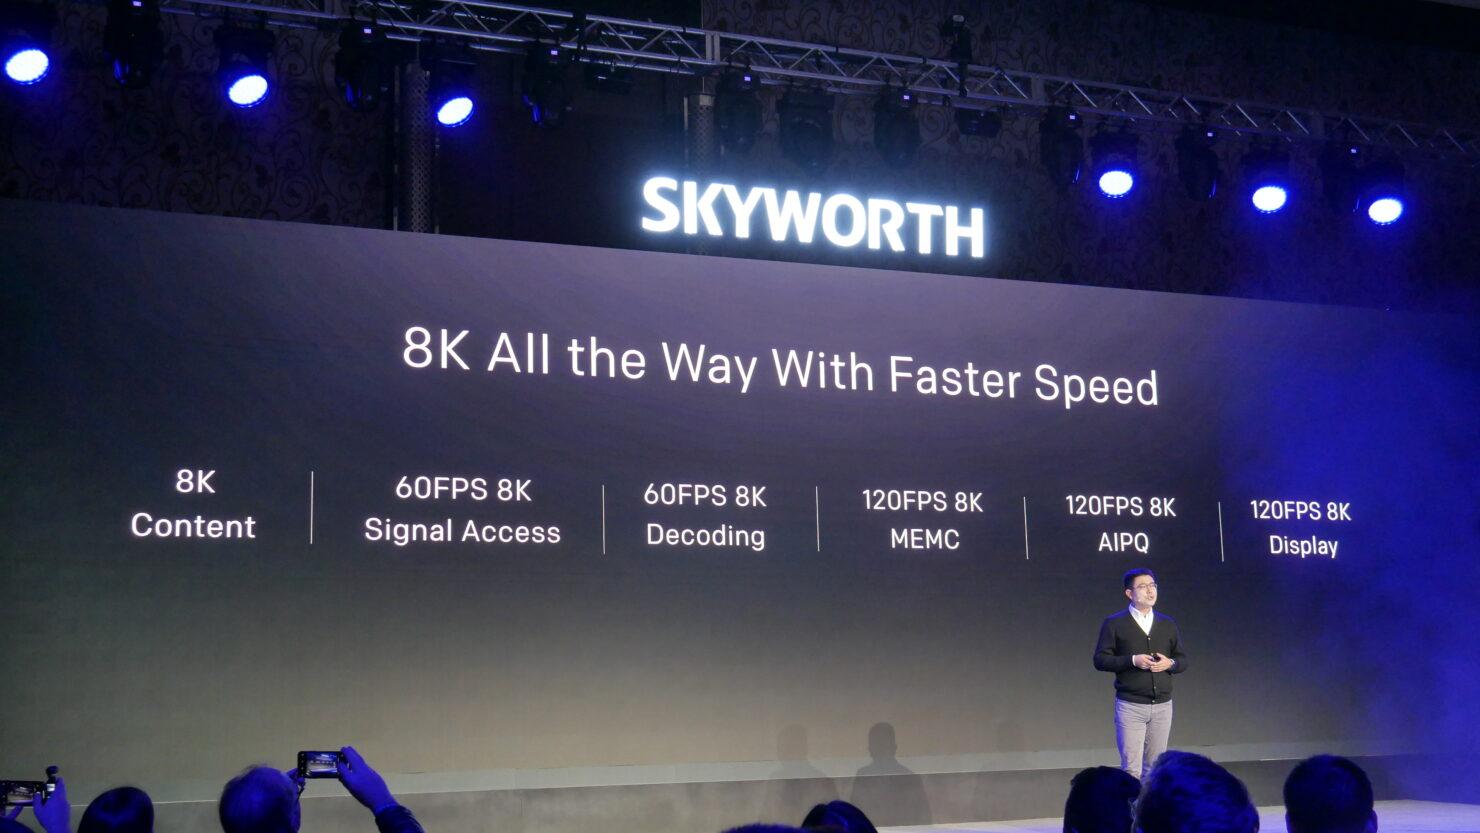 skyworth-ces-8k-specs